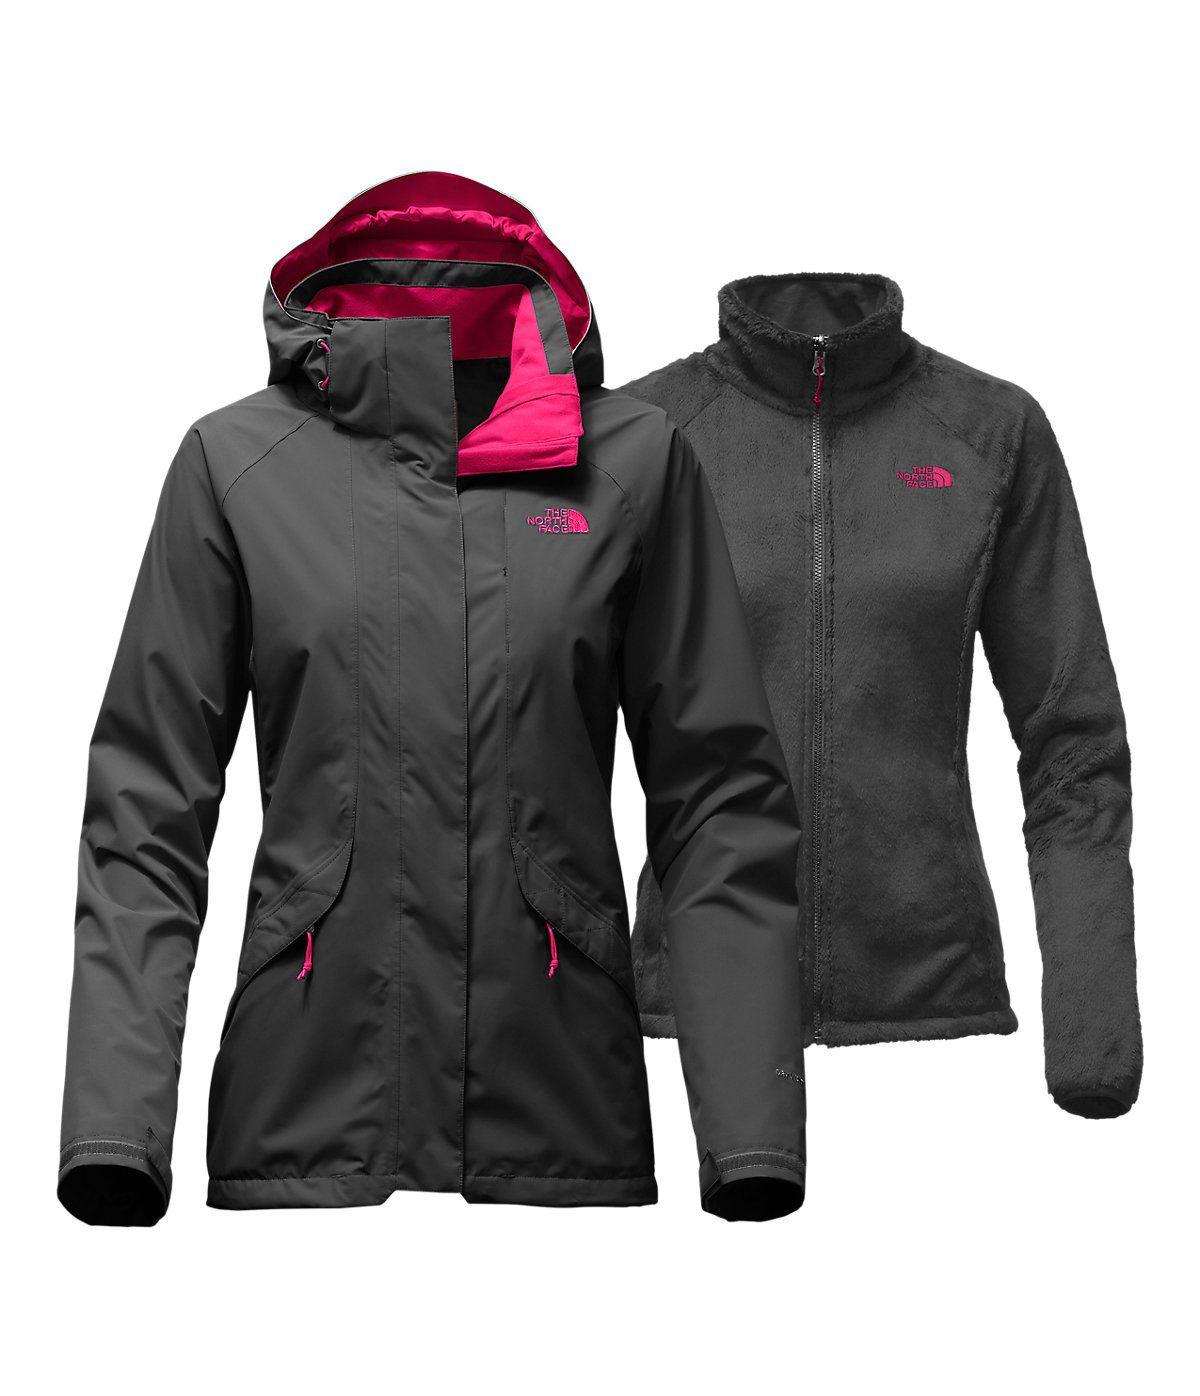 The North Face Boundary Triclimate Jacket Women S Asphalt Grey Cerise Pink Medium Waterpr North Face Jacket Womens Womens Outdoor Clothing Triclimate Jacket [ 1396 x 1200 Pixel ]